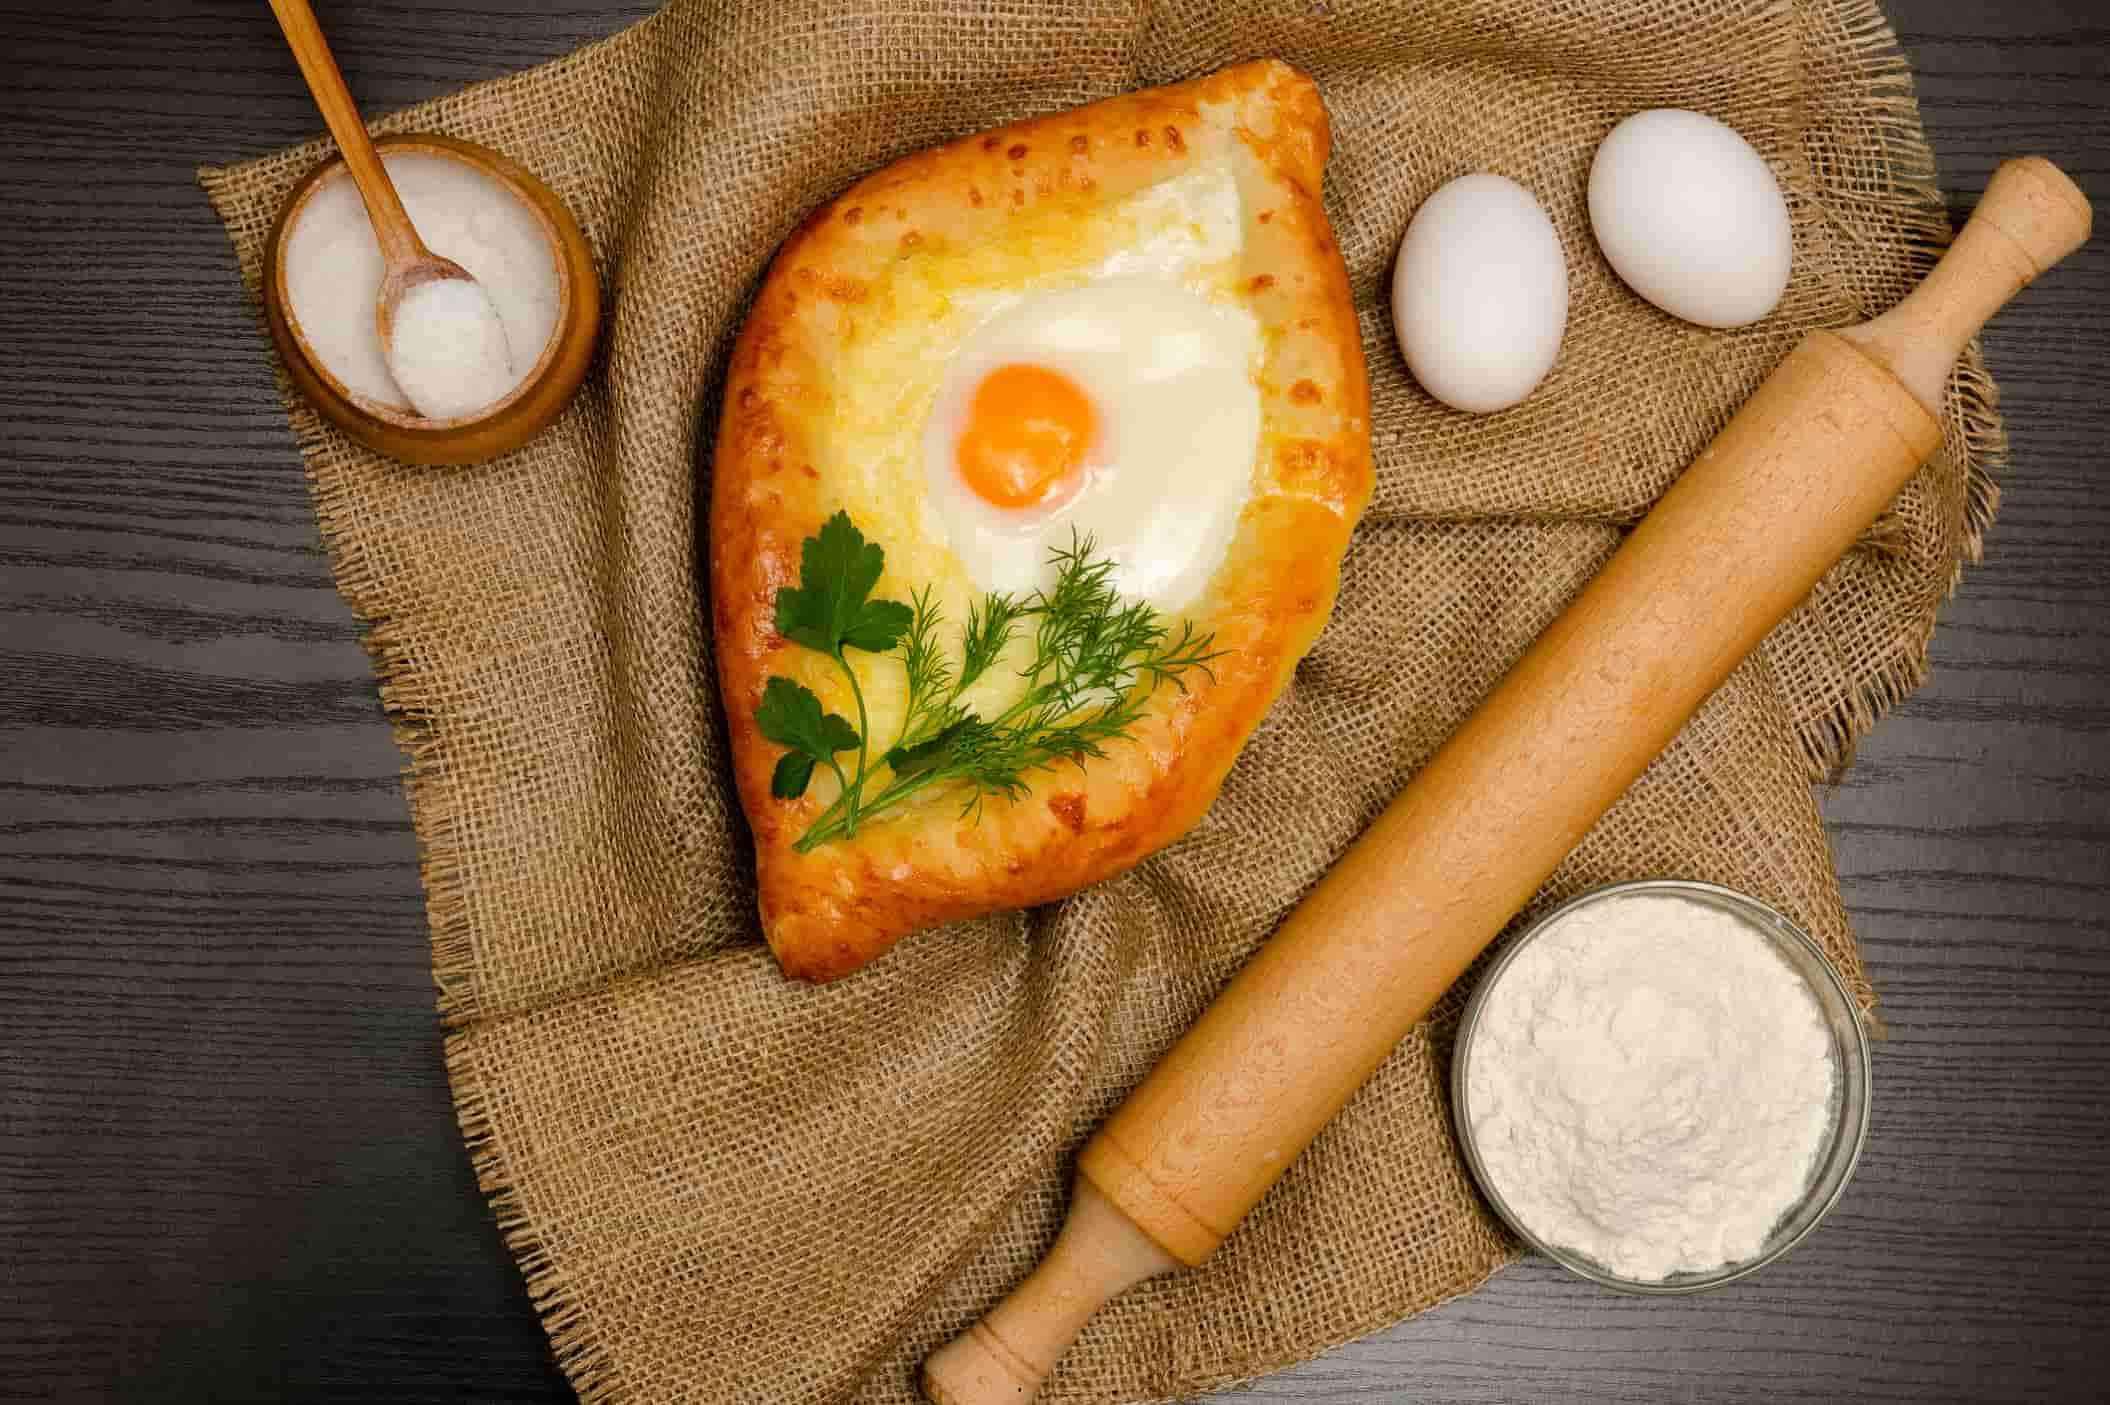 хачапури по-аджарски, грузинская еда, национальная кухня